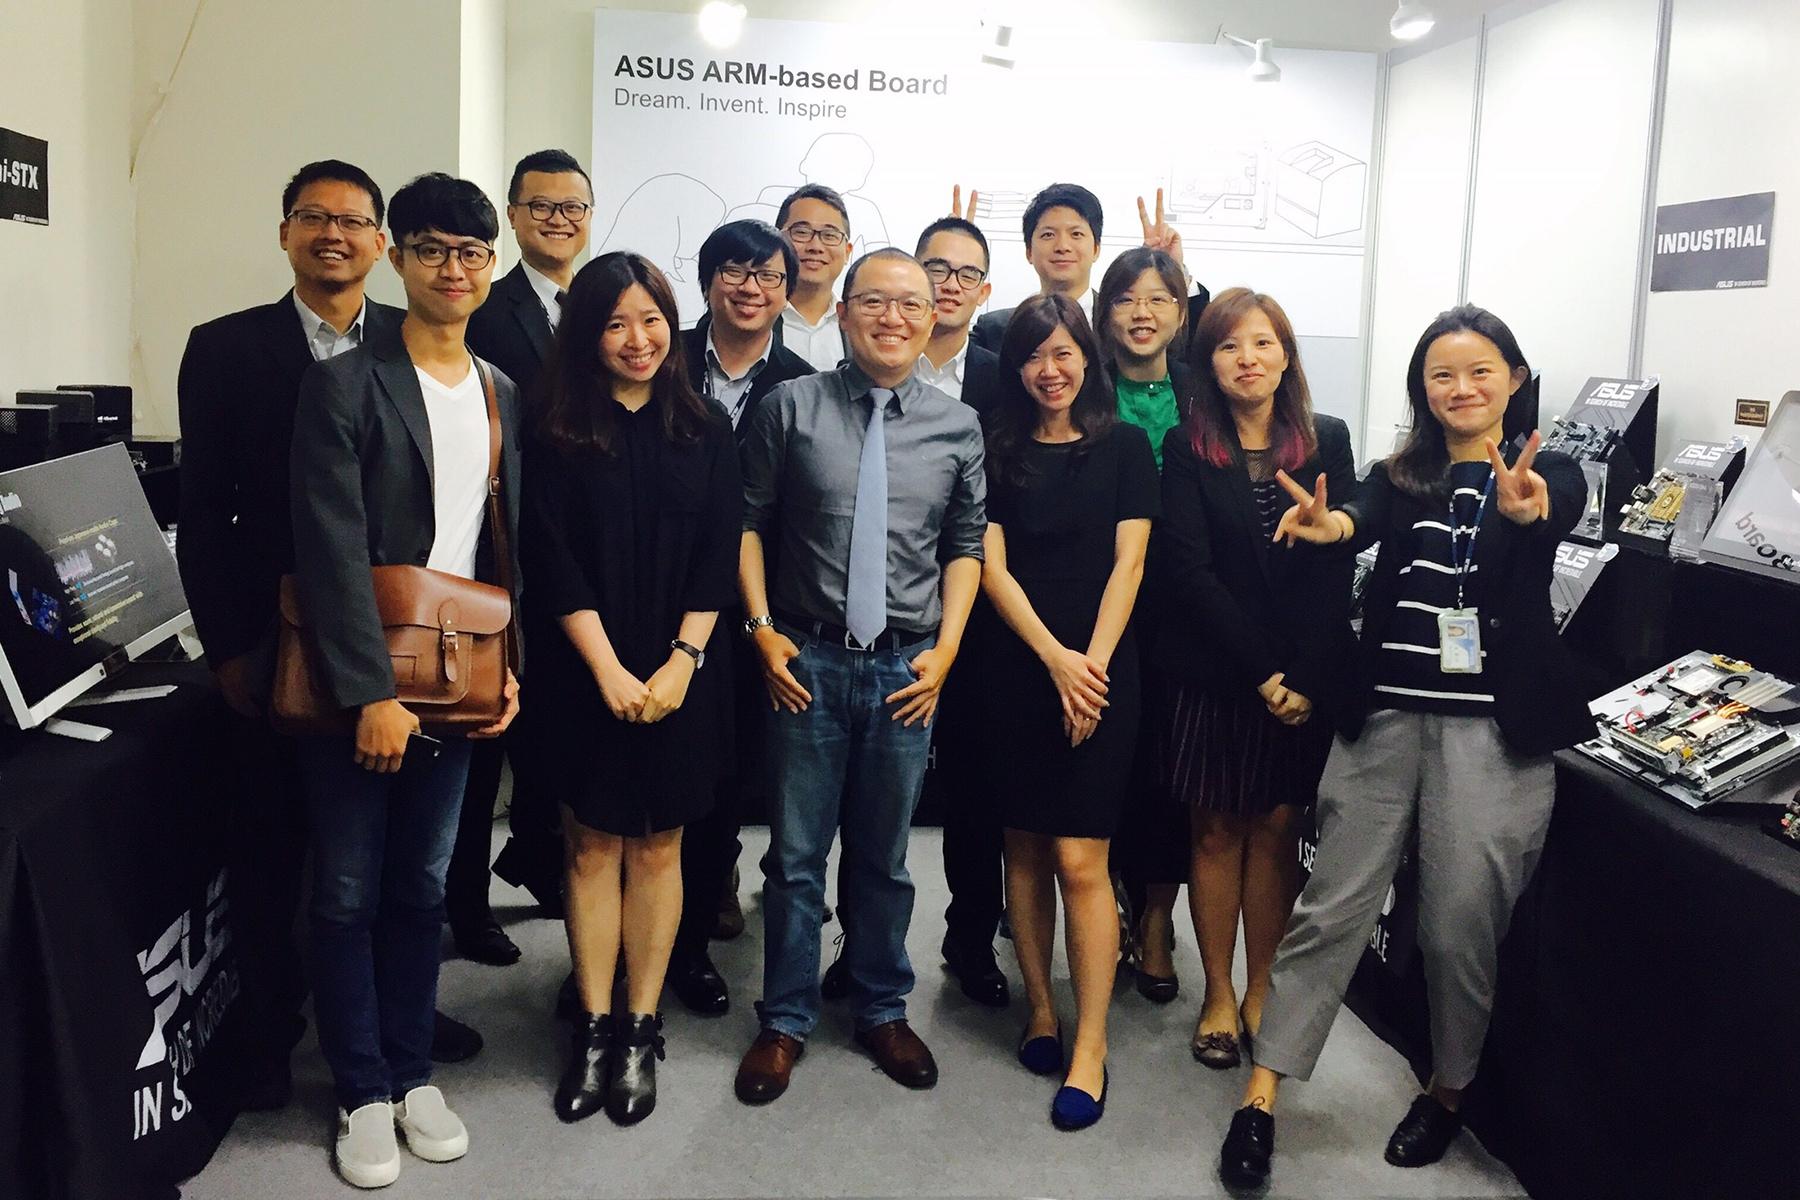 Me and my team at Computex Taipei 2015. Love you SI team!